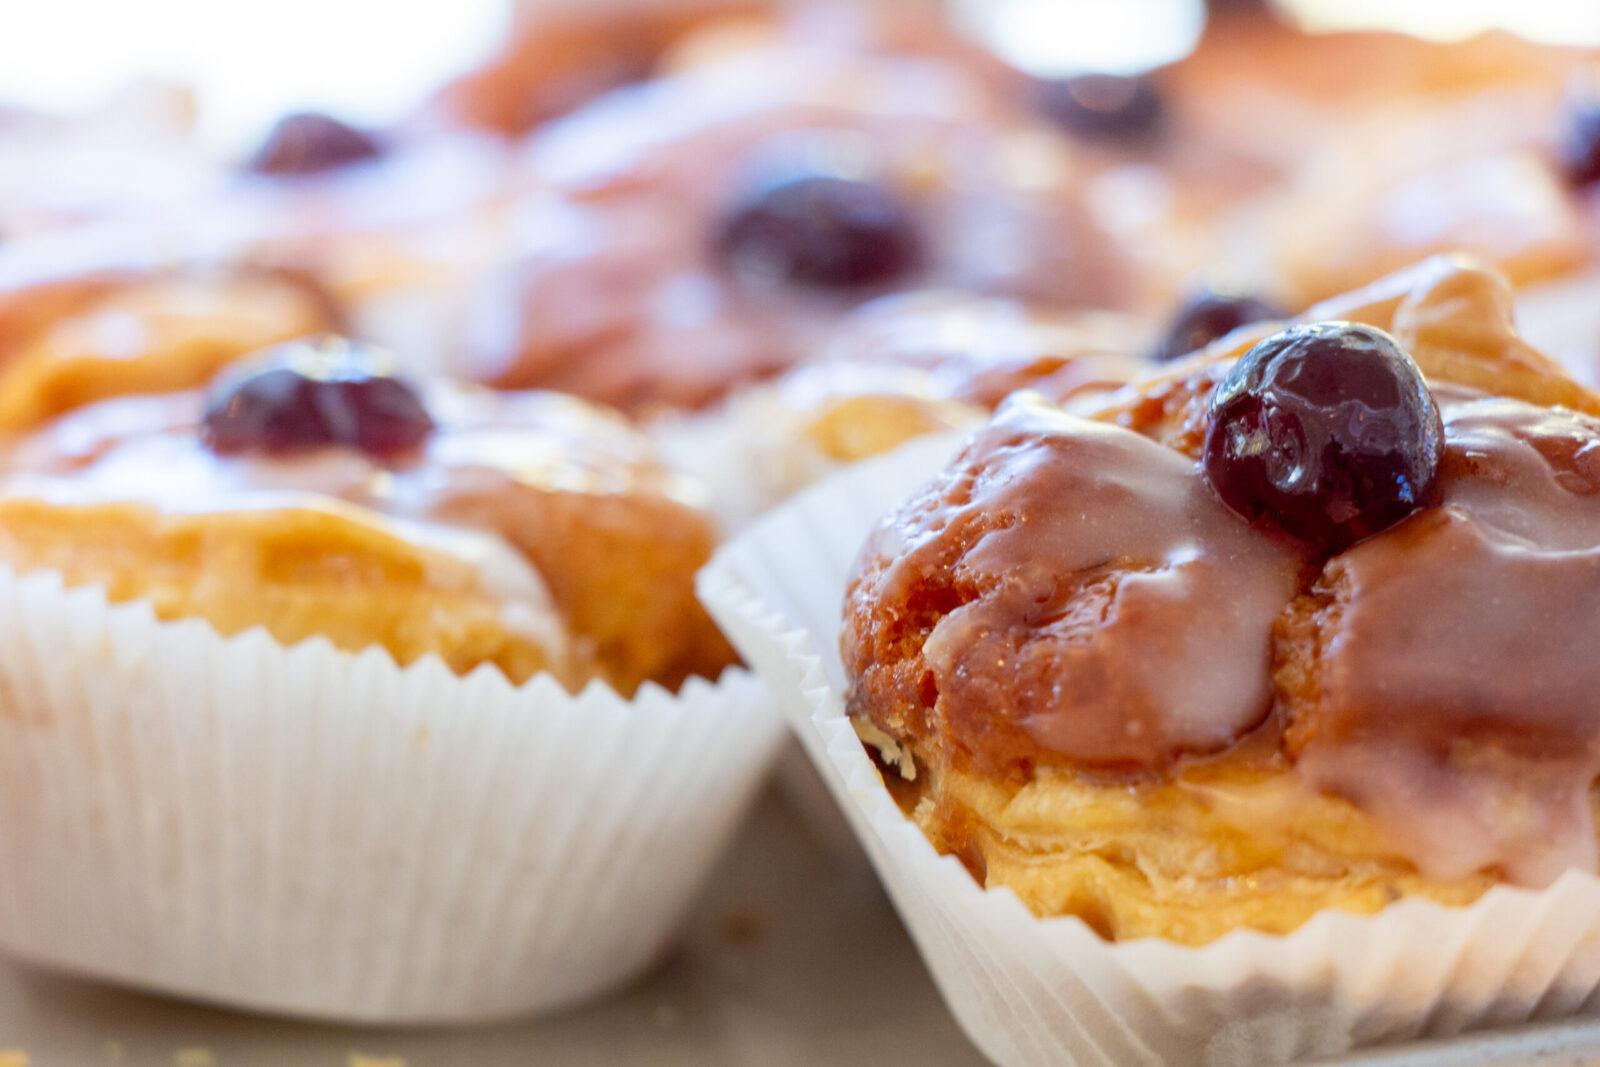 Conditorei & Café Bösewetter - Desserts